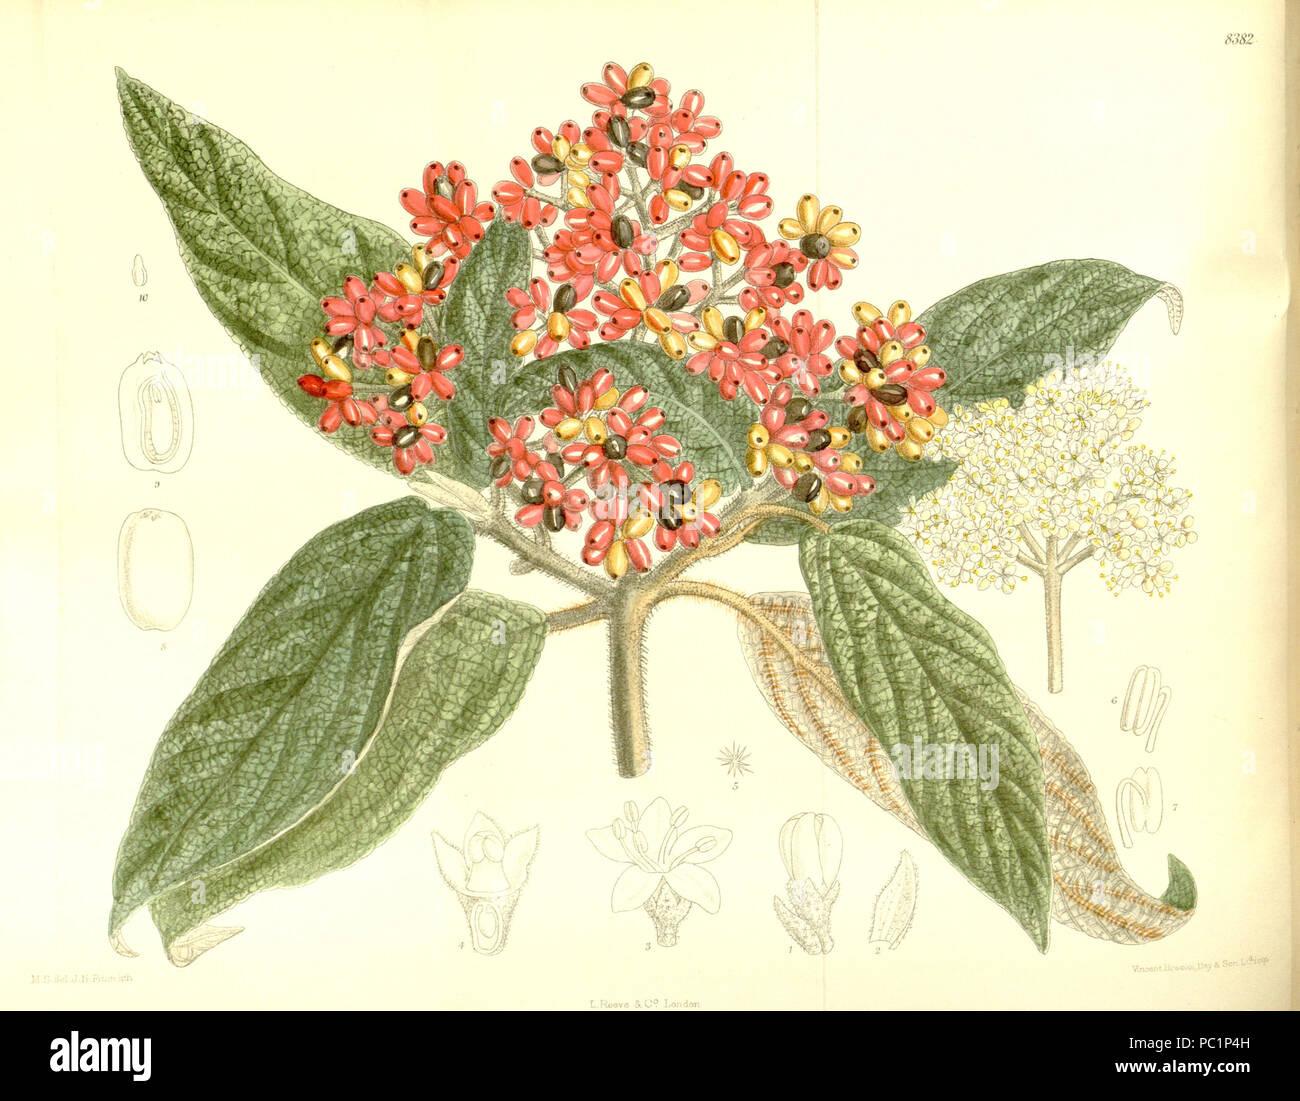 630 Viburnum rhytidophyllum 137-8382 - Stock Image